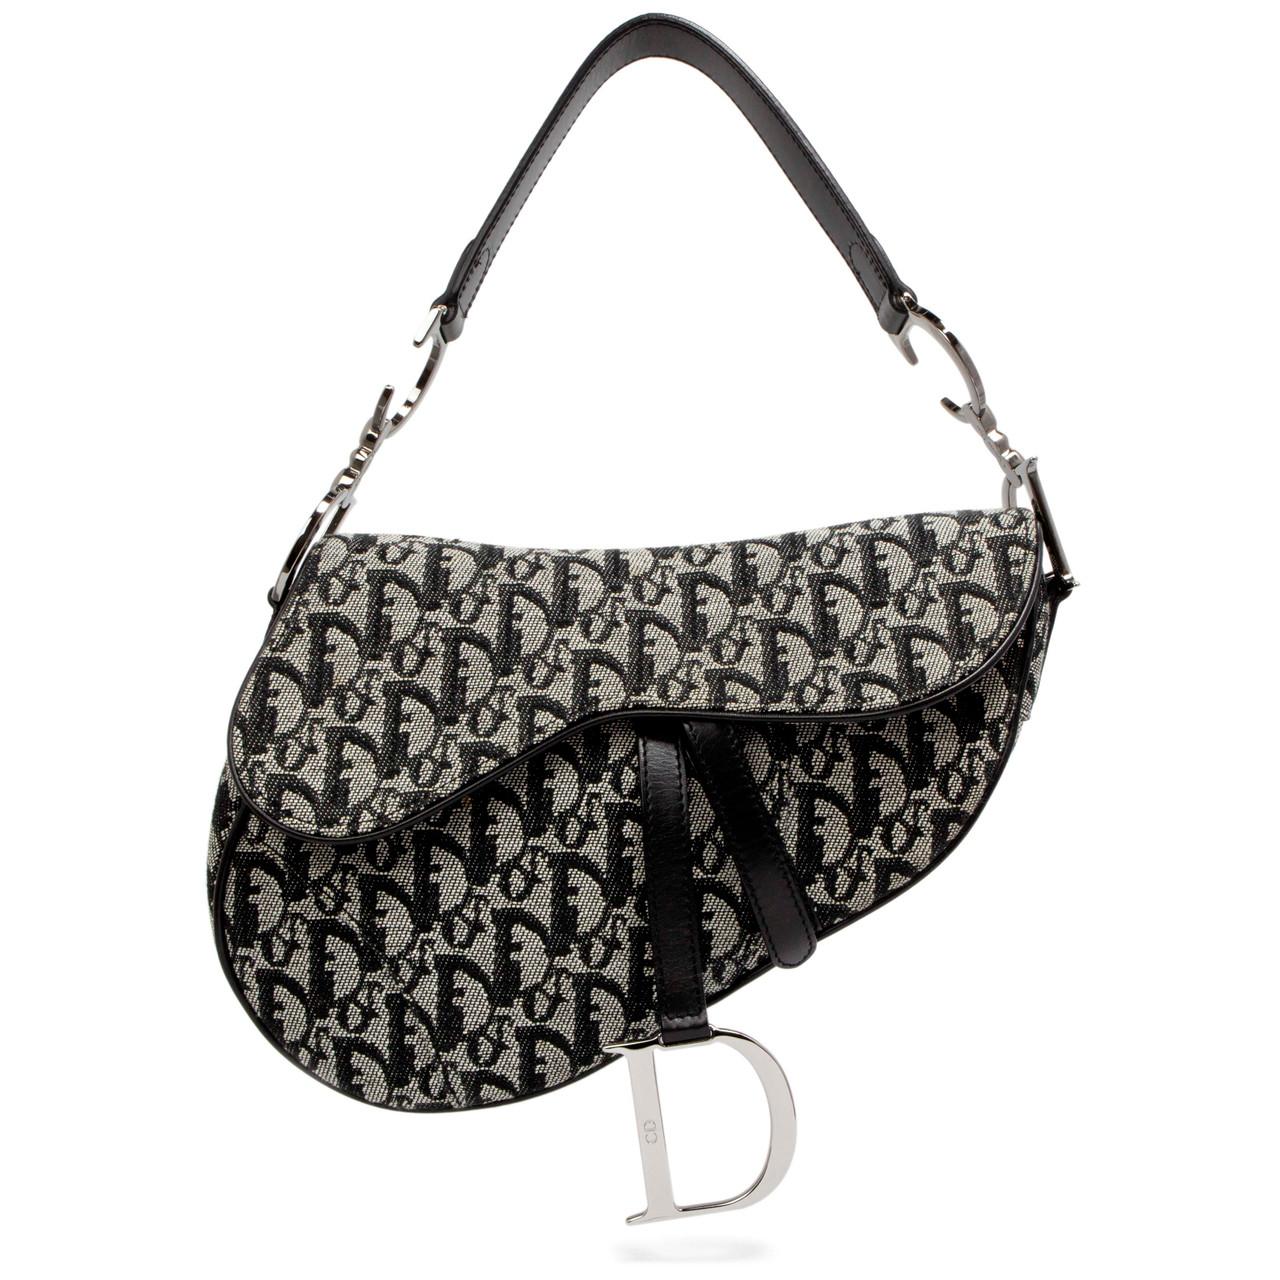 5e449f1d229 Christian Dior Black Monogram Saddle Bag - modaselle